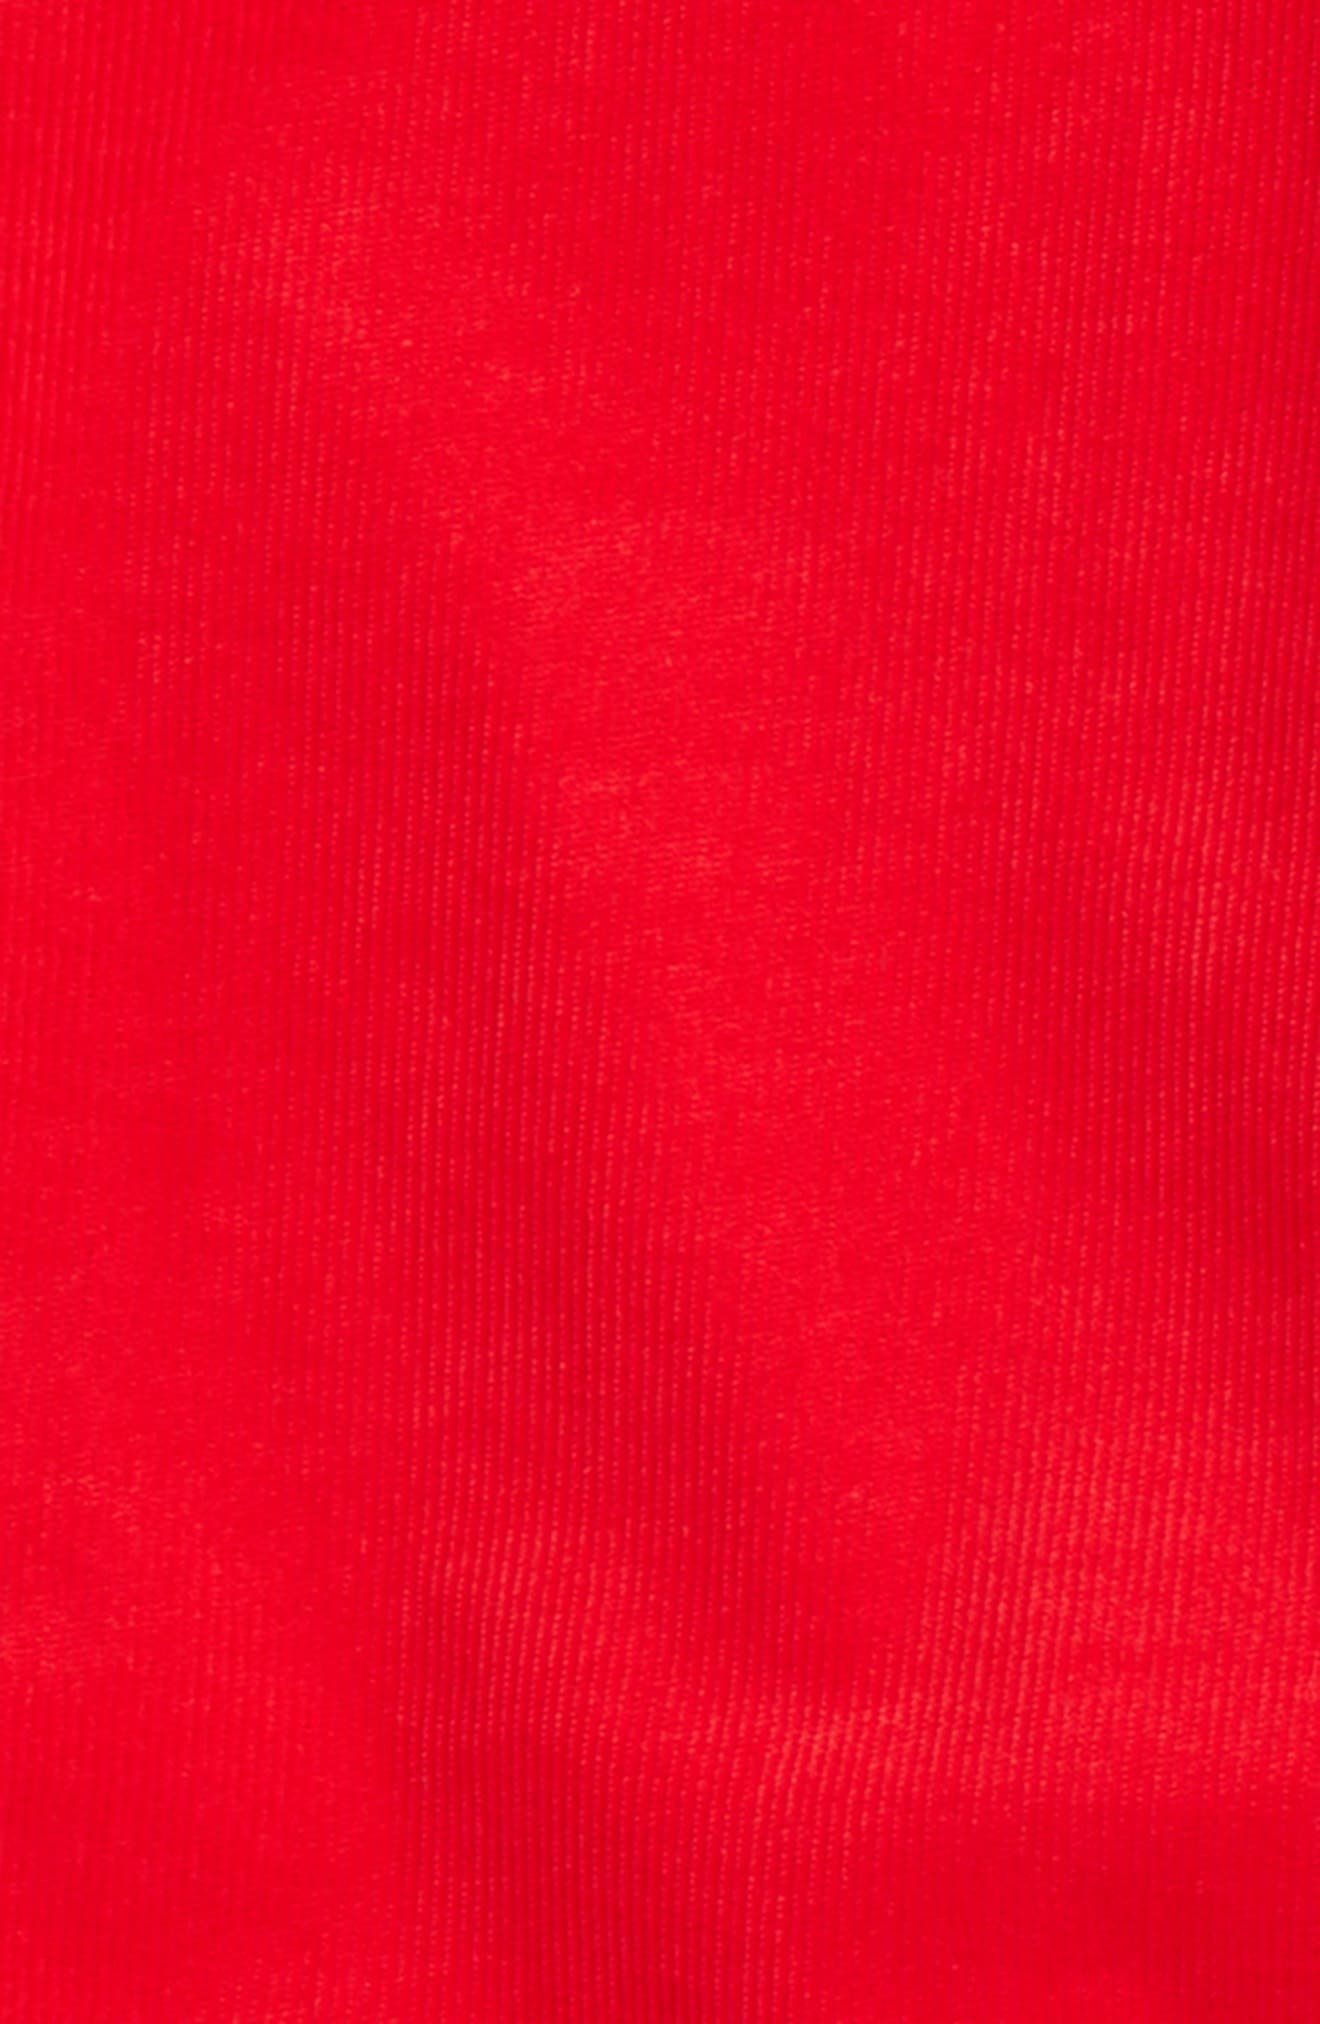 Breaker Corduroy Pants,                             Alternate thumbnail 2, color,                             Lighthouse Red